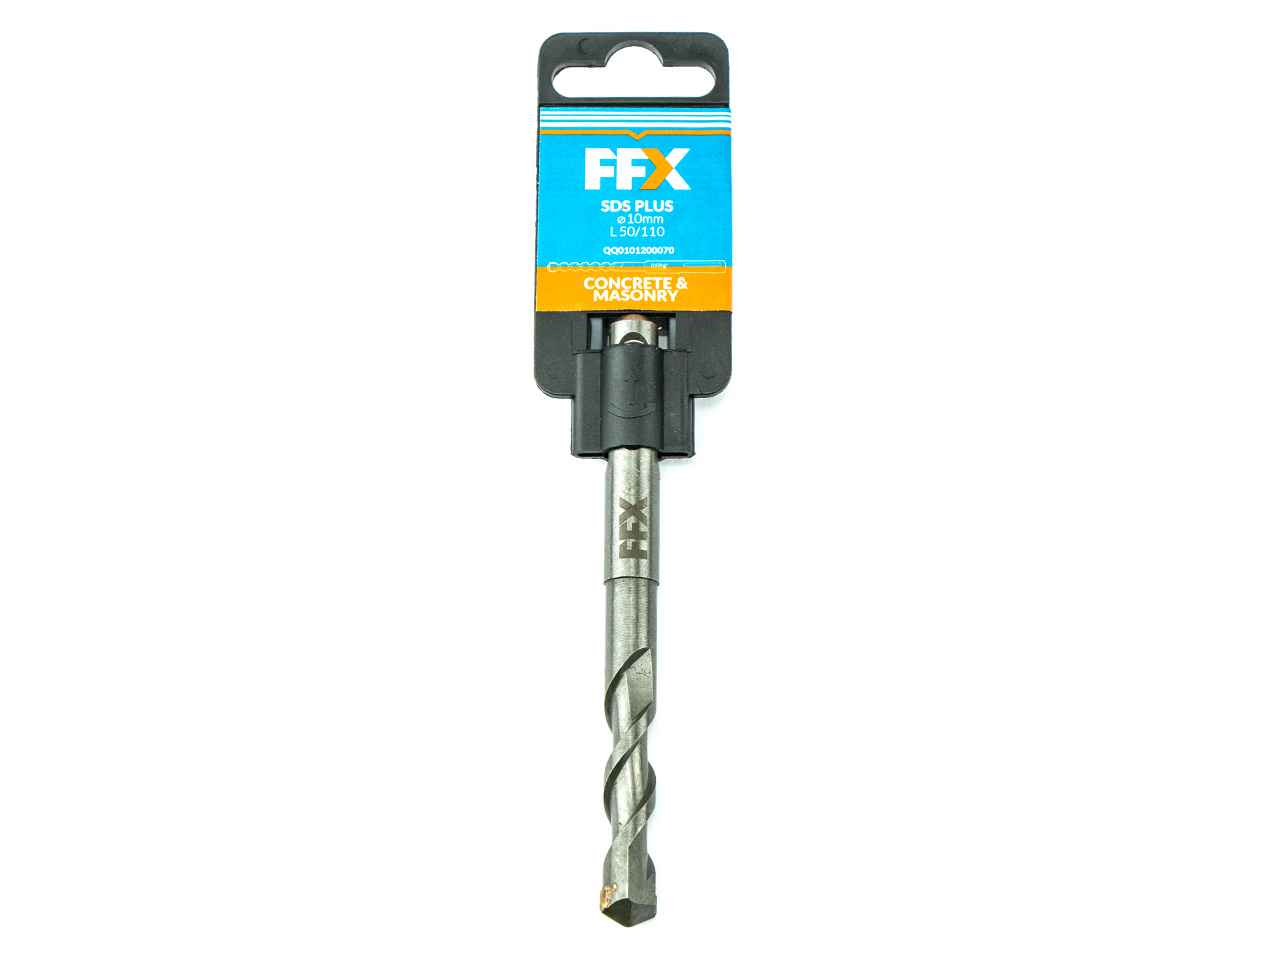 FFX_QQ0101200070.jpg